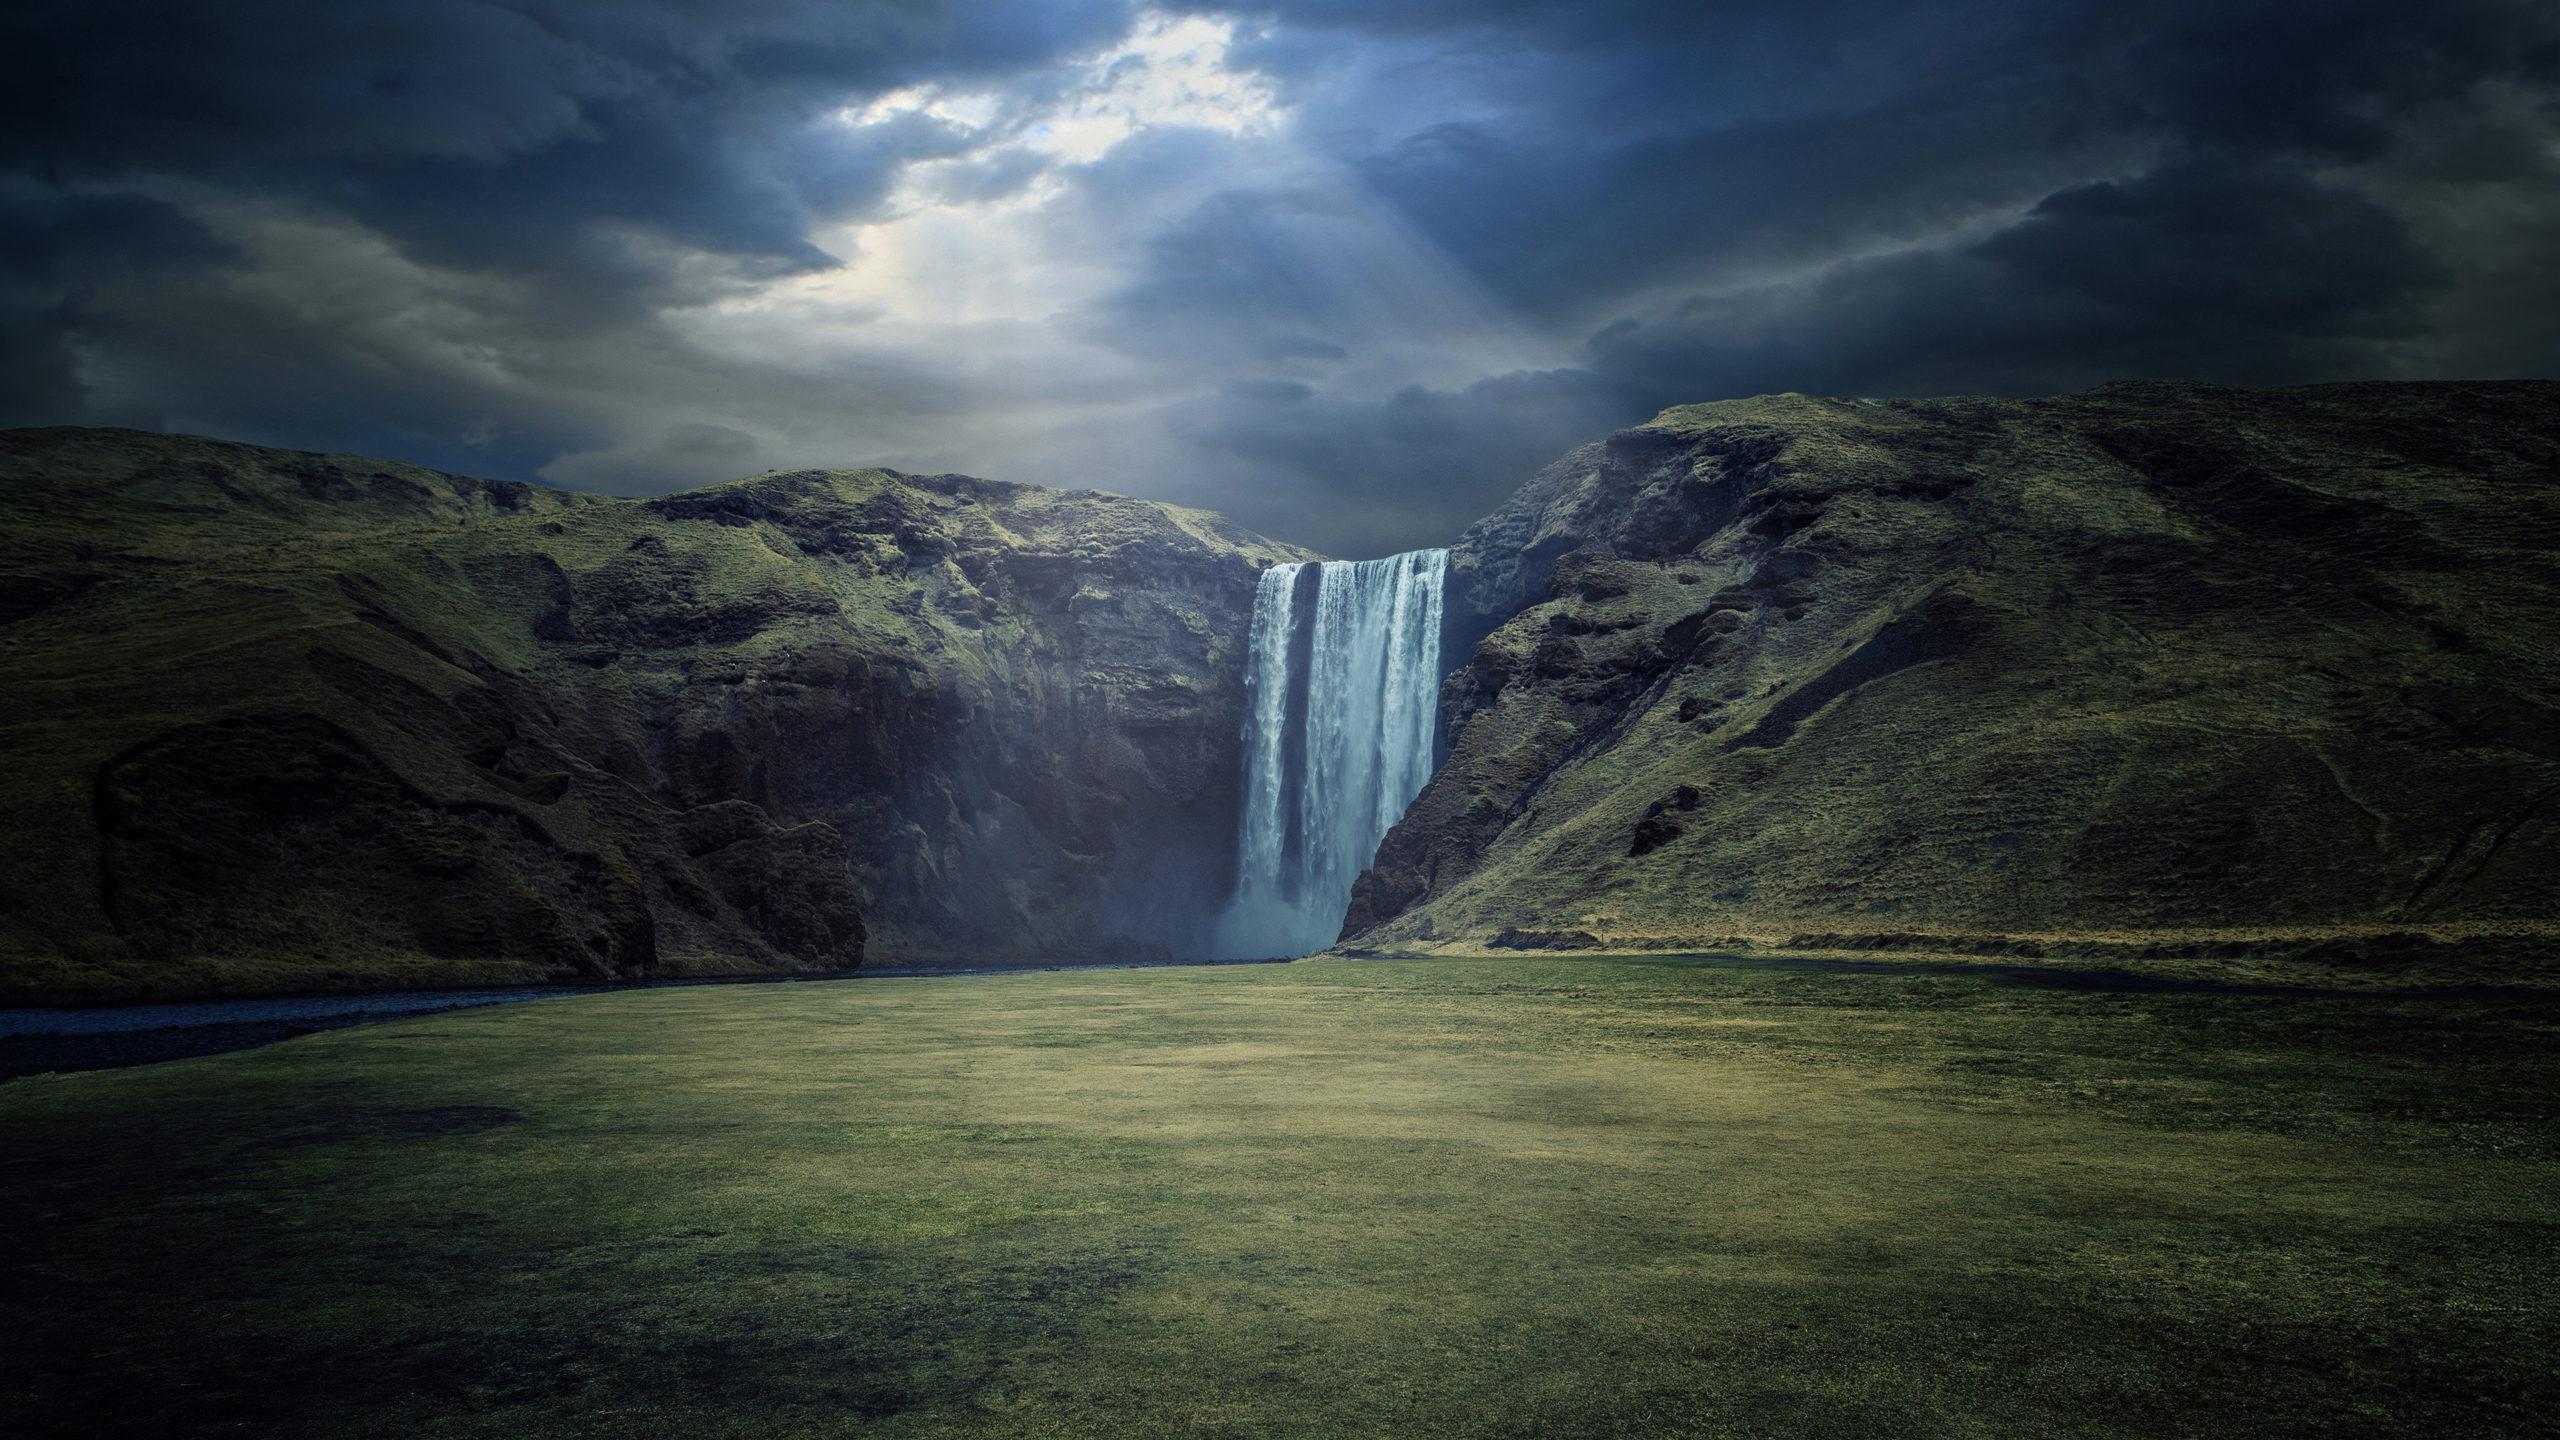 waterfall hd wallpapers 1080p